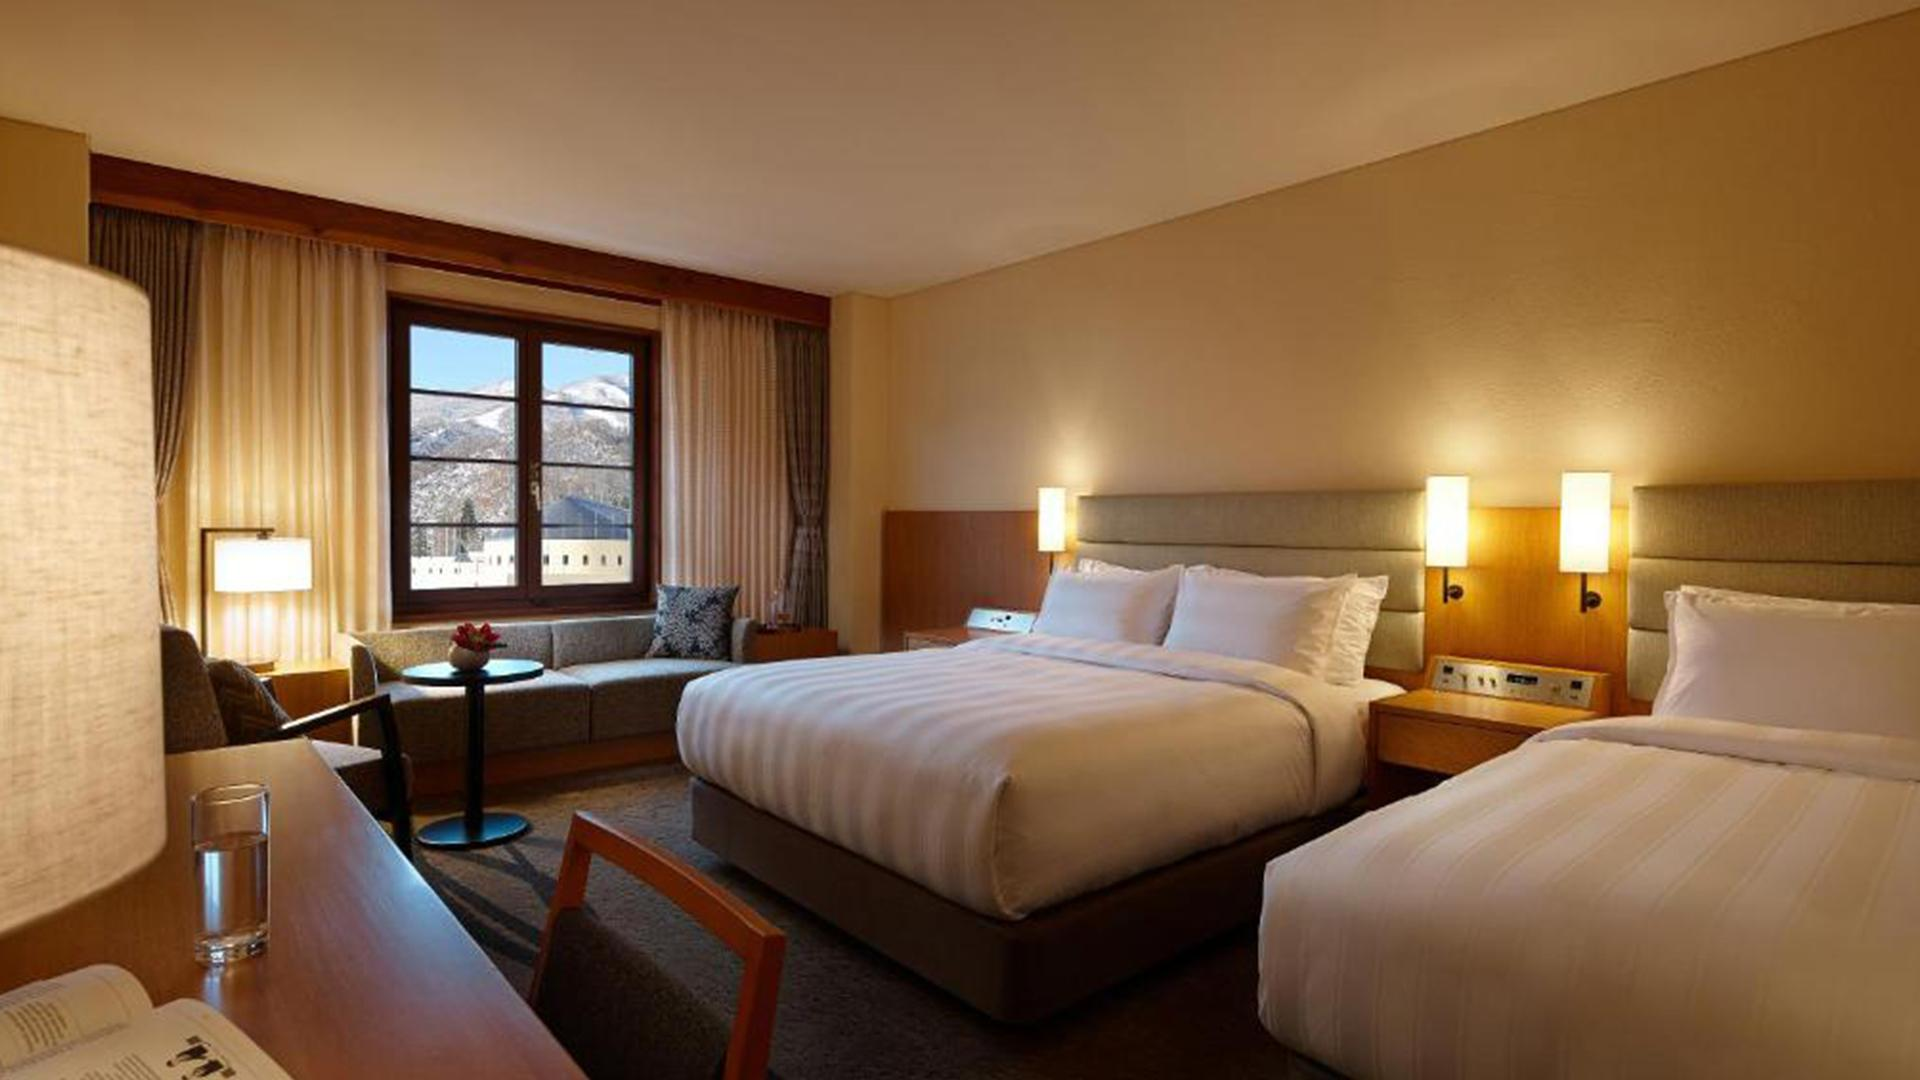 Superior Family Twin Room image 1 at Lotte Arai Resort by null, Niigata, Japan